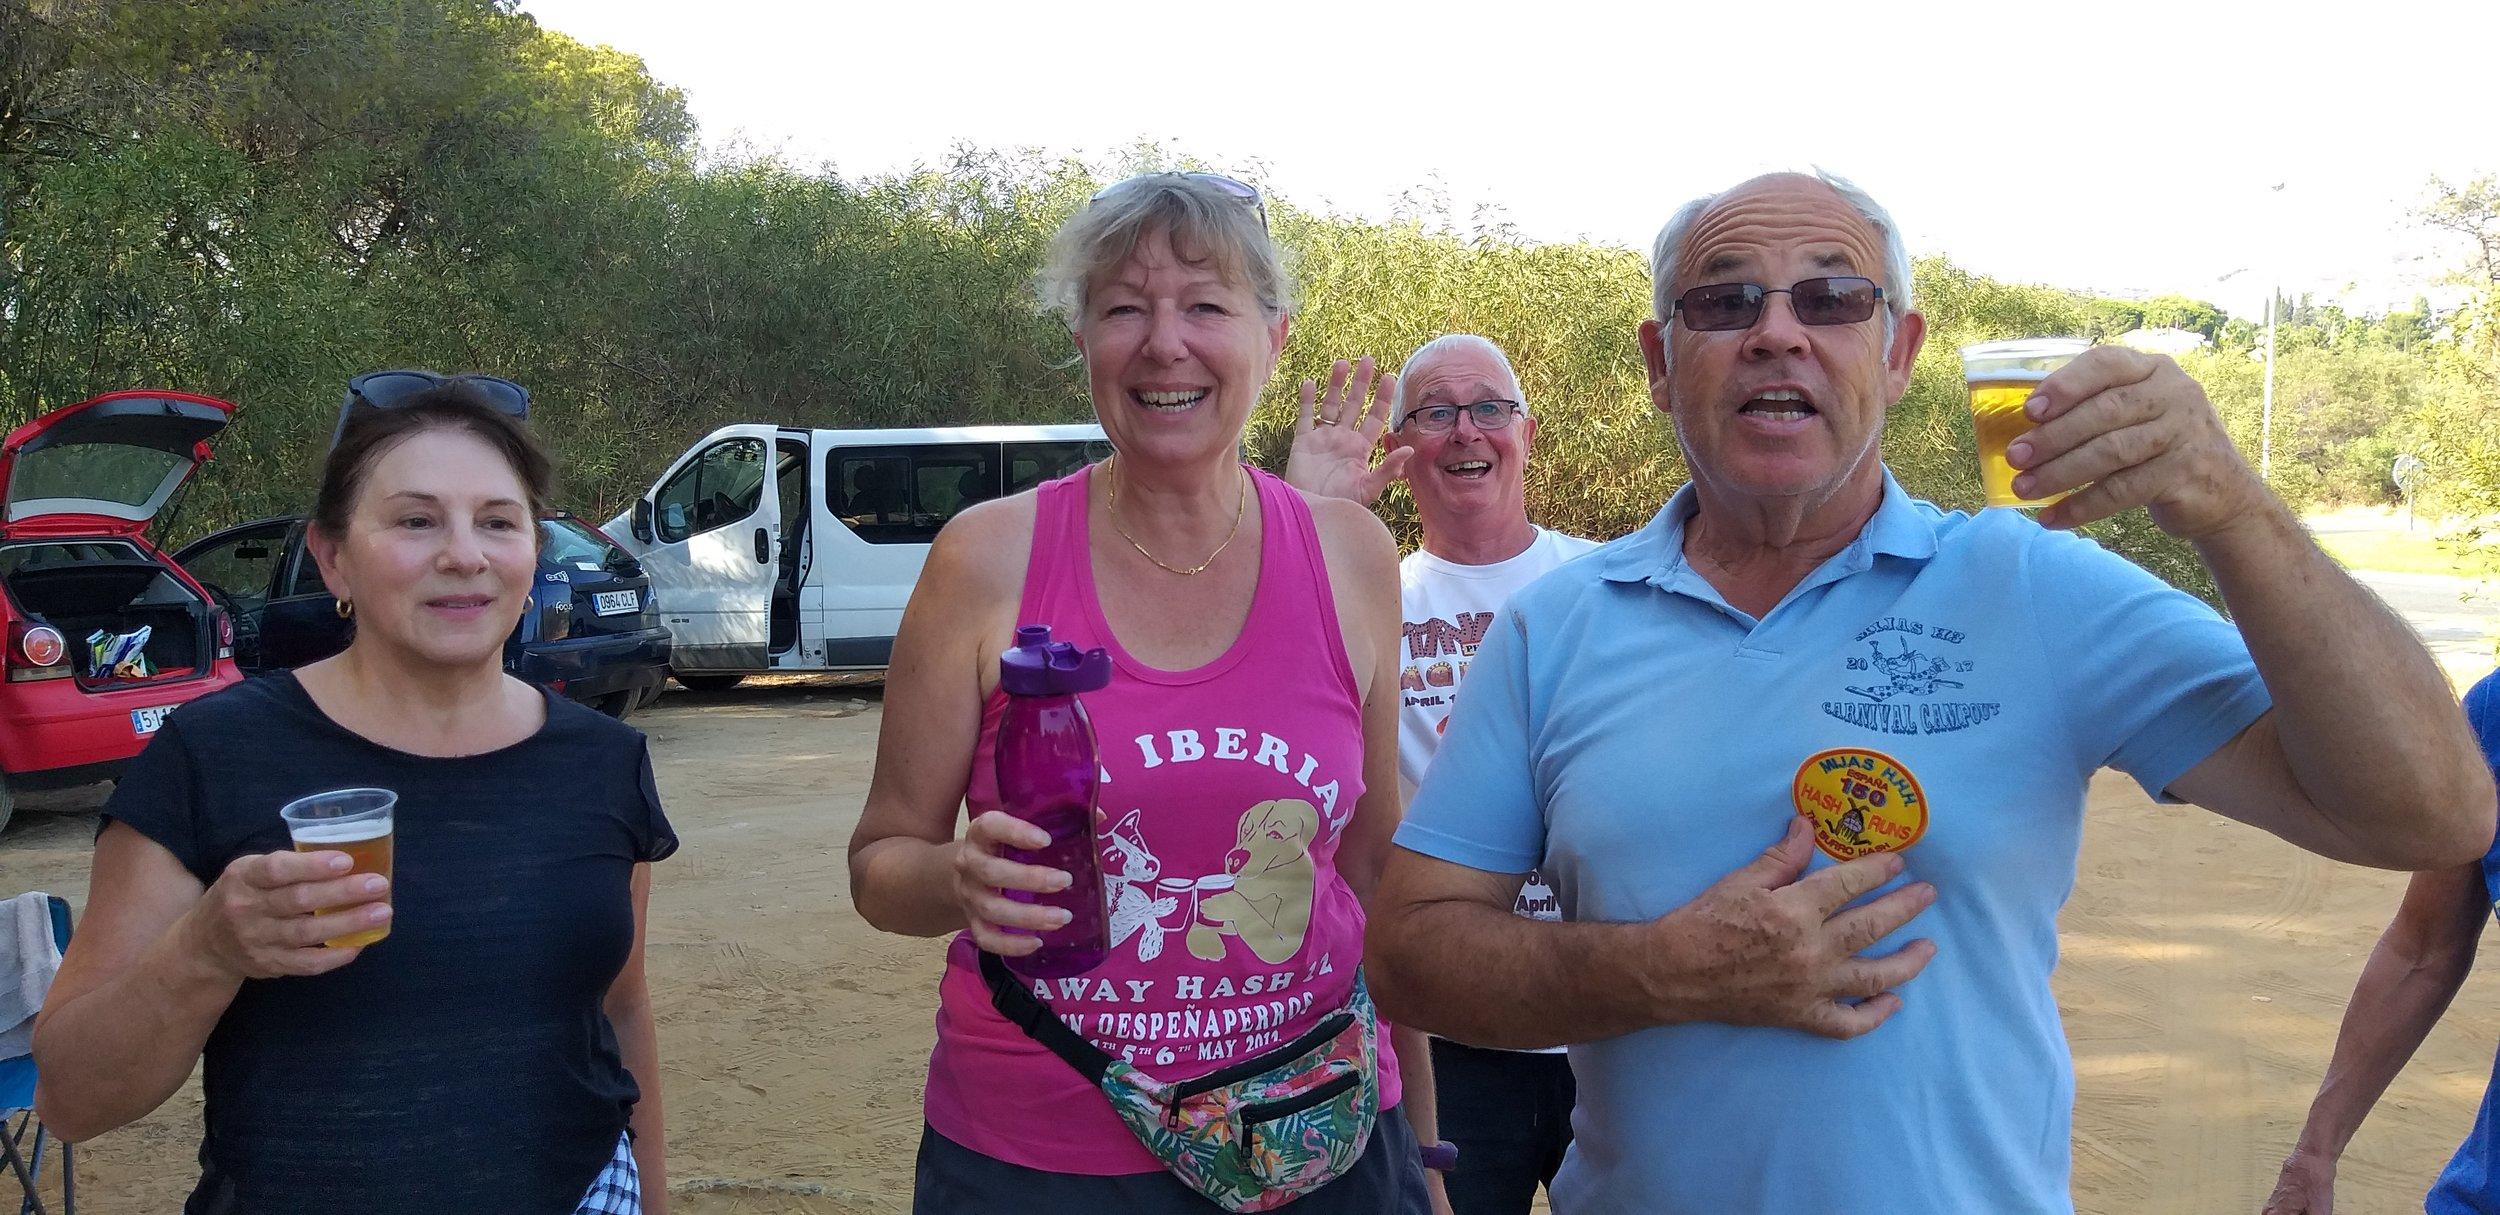 Hash Flash - olden Cascade - Run 1651 - 04 Aug 2019 - Photo 8.jpg